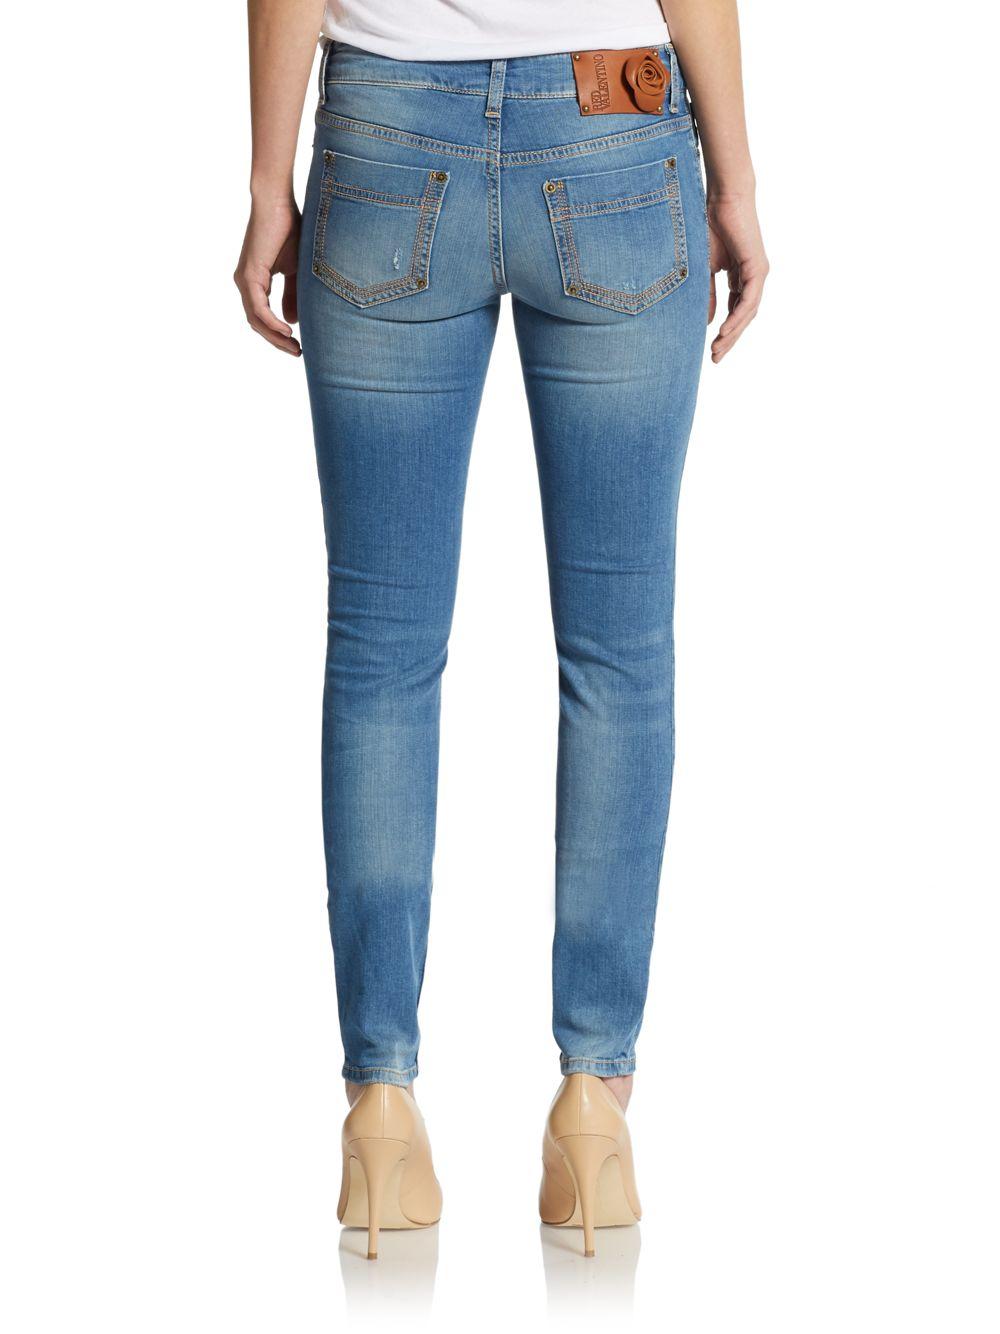 ASOS DESIGN extreme super skinny jeans in light gray biker and hem detail. $ ASOS DESIGN Plus extreme super skinny jeans with knee rips in black. $ Pull&Bear slim jeans in light blue with rips. $ Pull&Bear Slim Jeans In Dark Blue. $ Pull&Bear Slim Fit Jeans In Black.